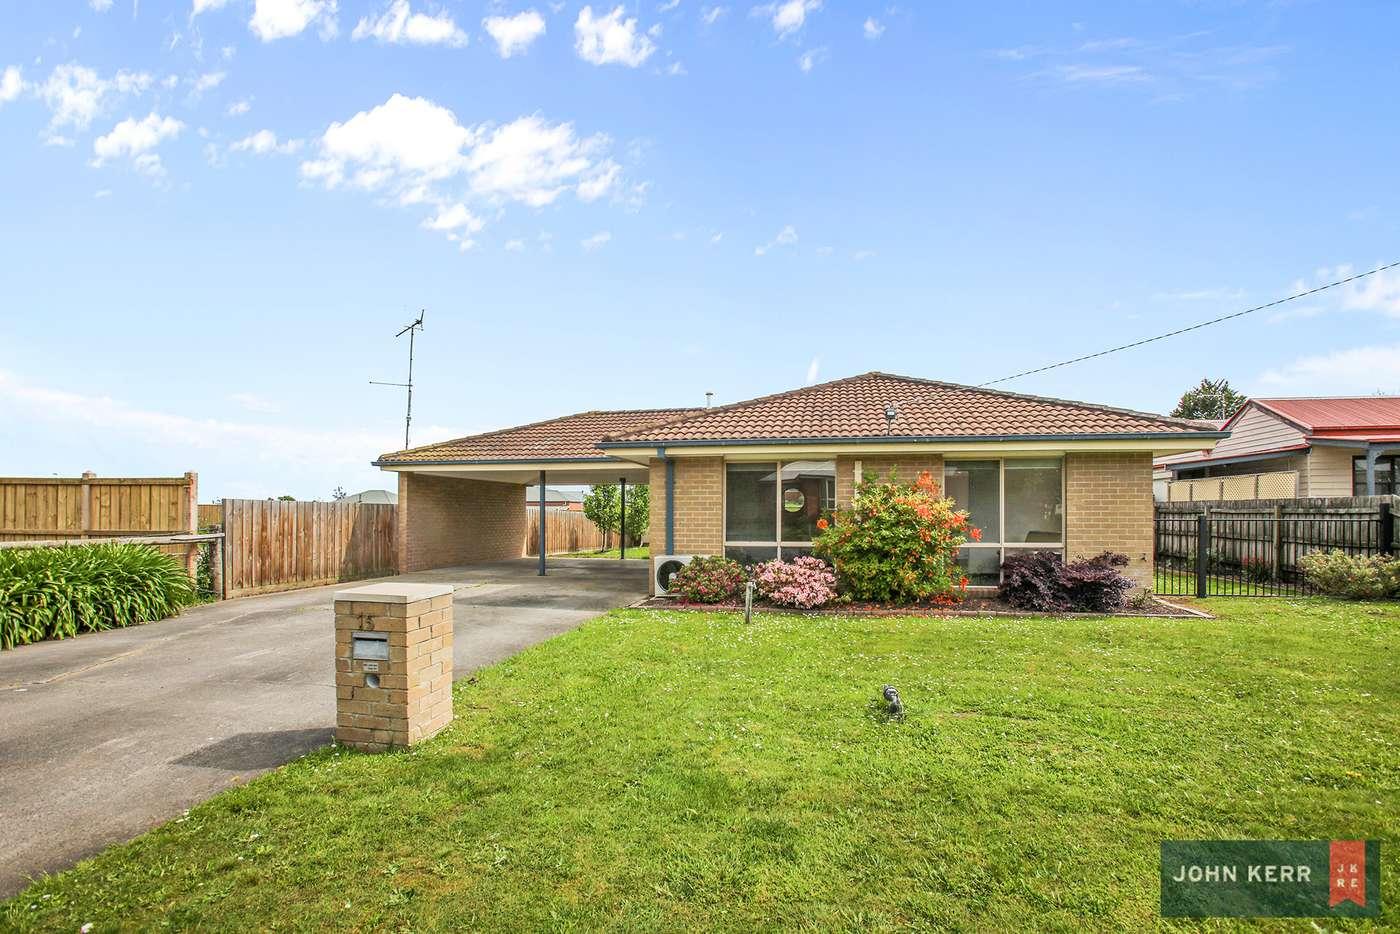 Main view of Homely house listing, 15 Centenary Drive, Trafalgar VIC 3824